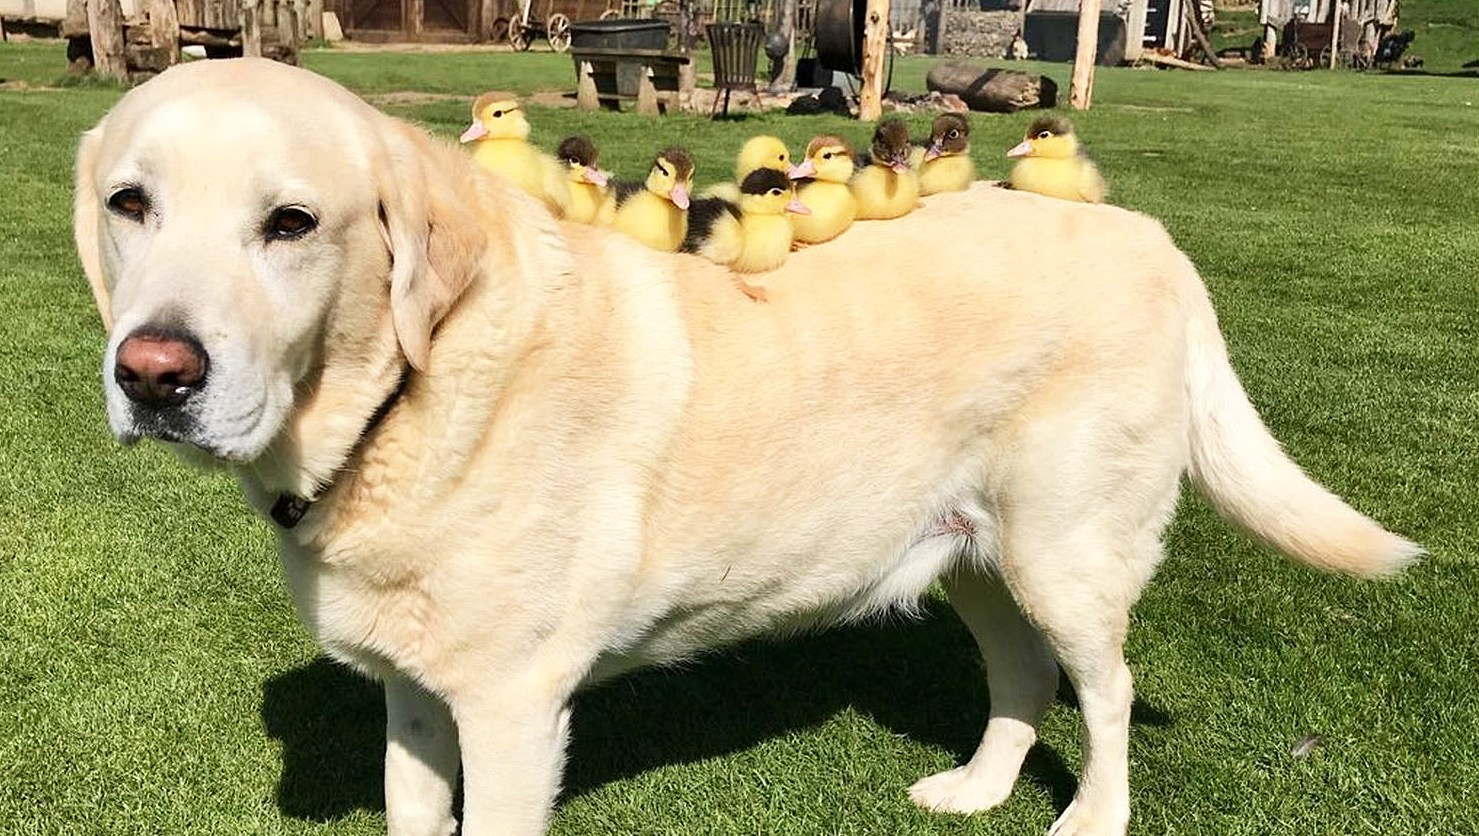 dog adopts ducklings